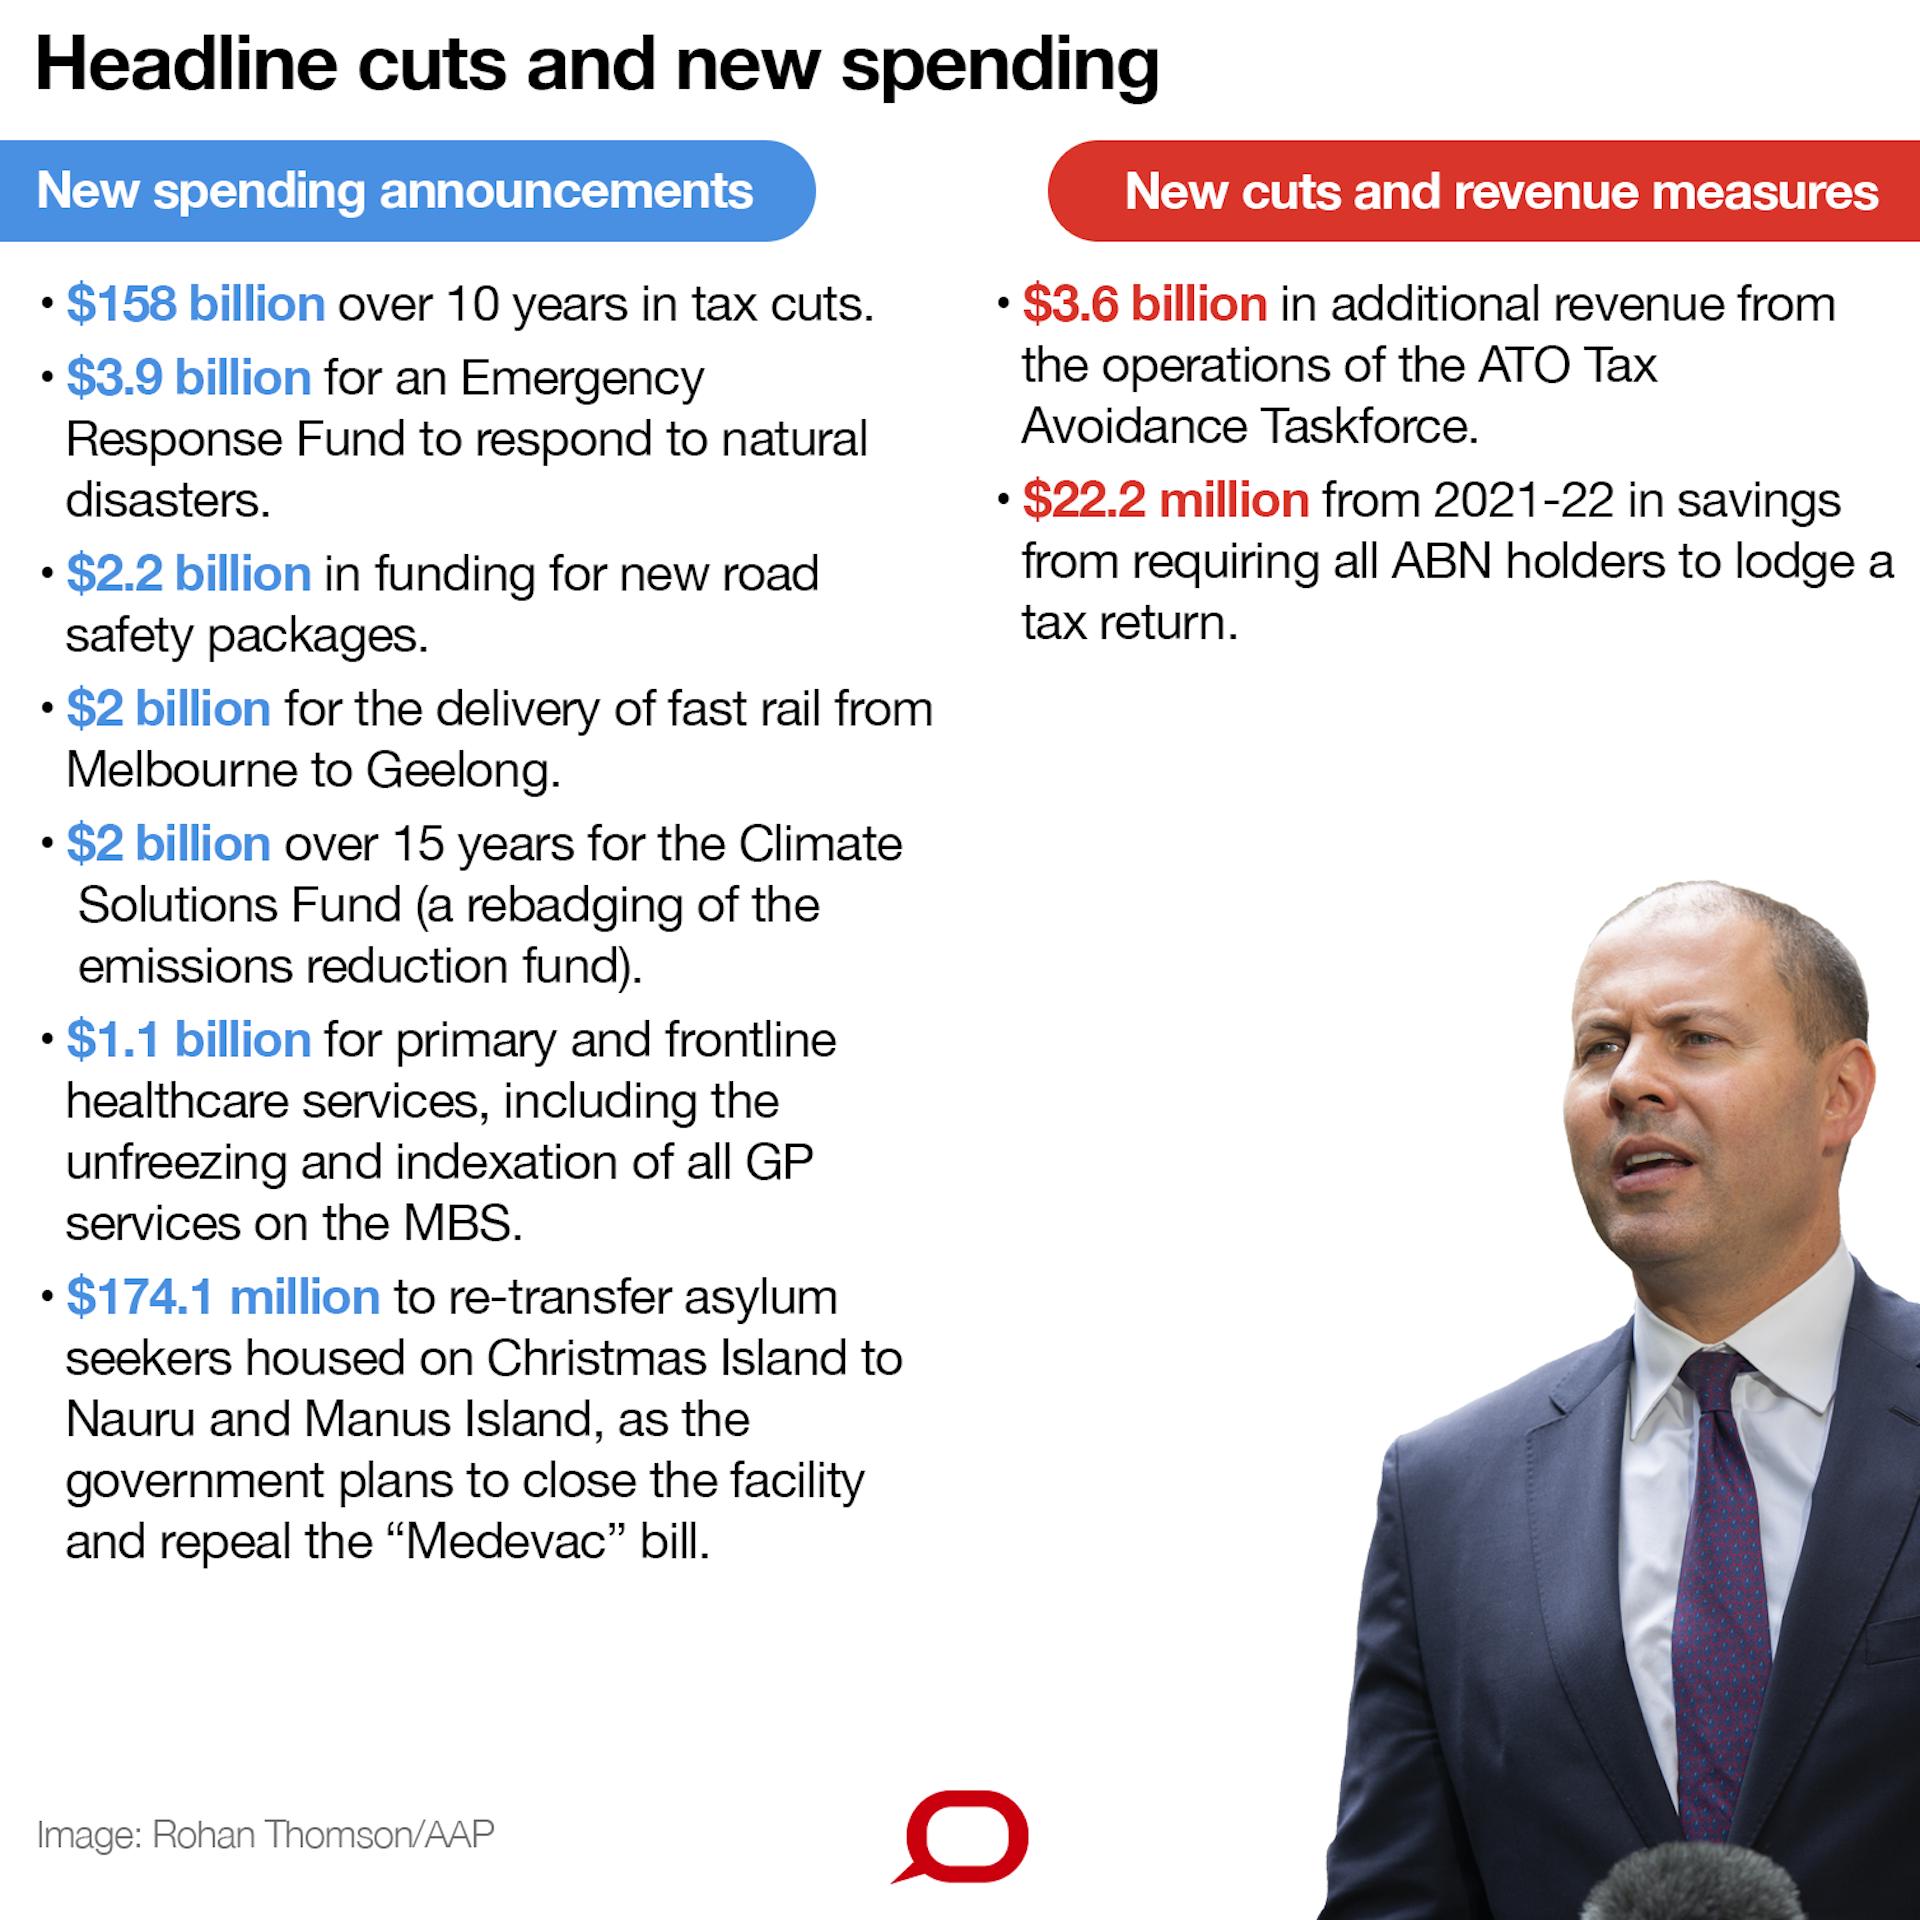 Frydenberg's budget looks toward zero net debt, but should this be our aim?